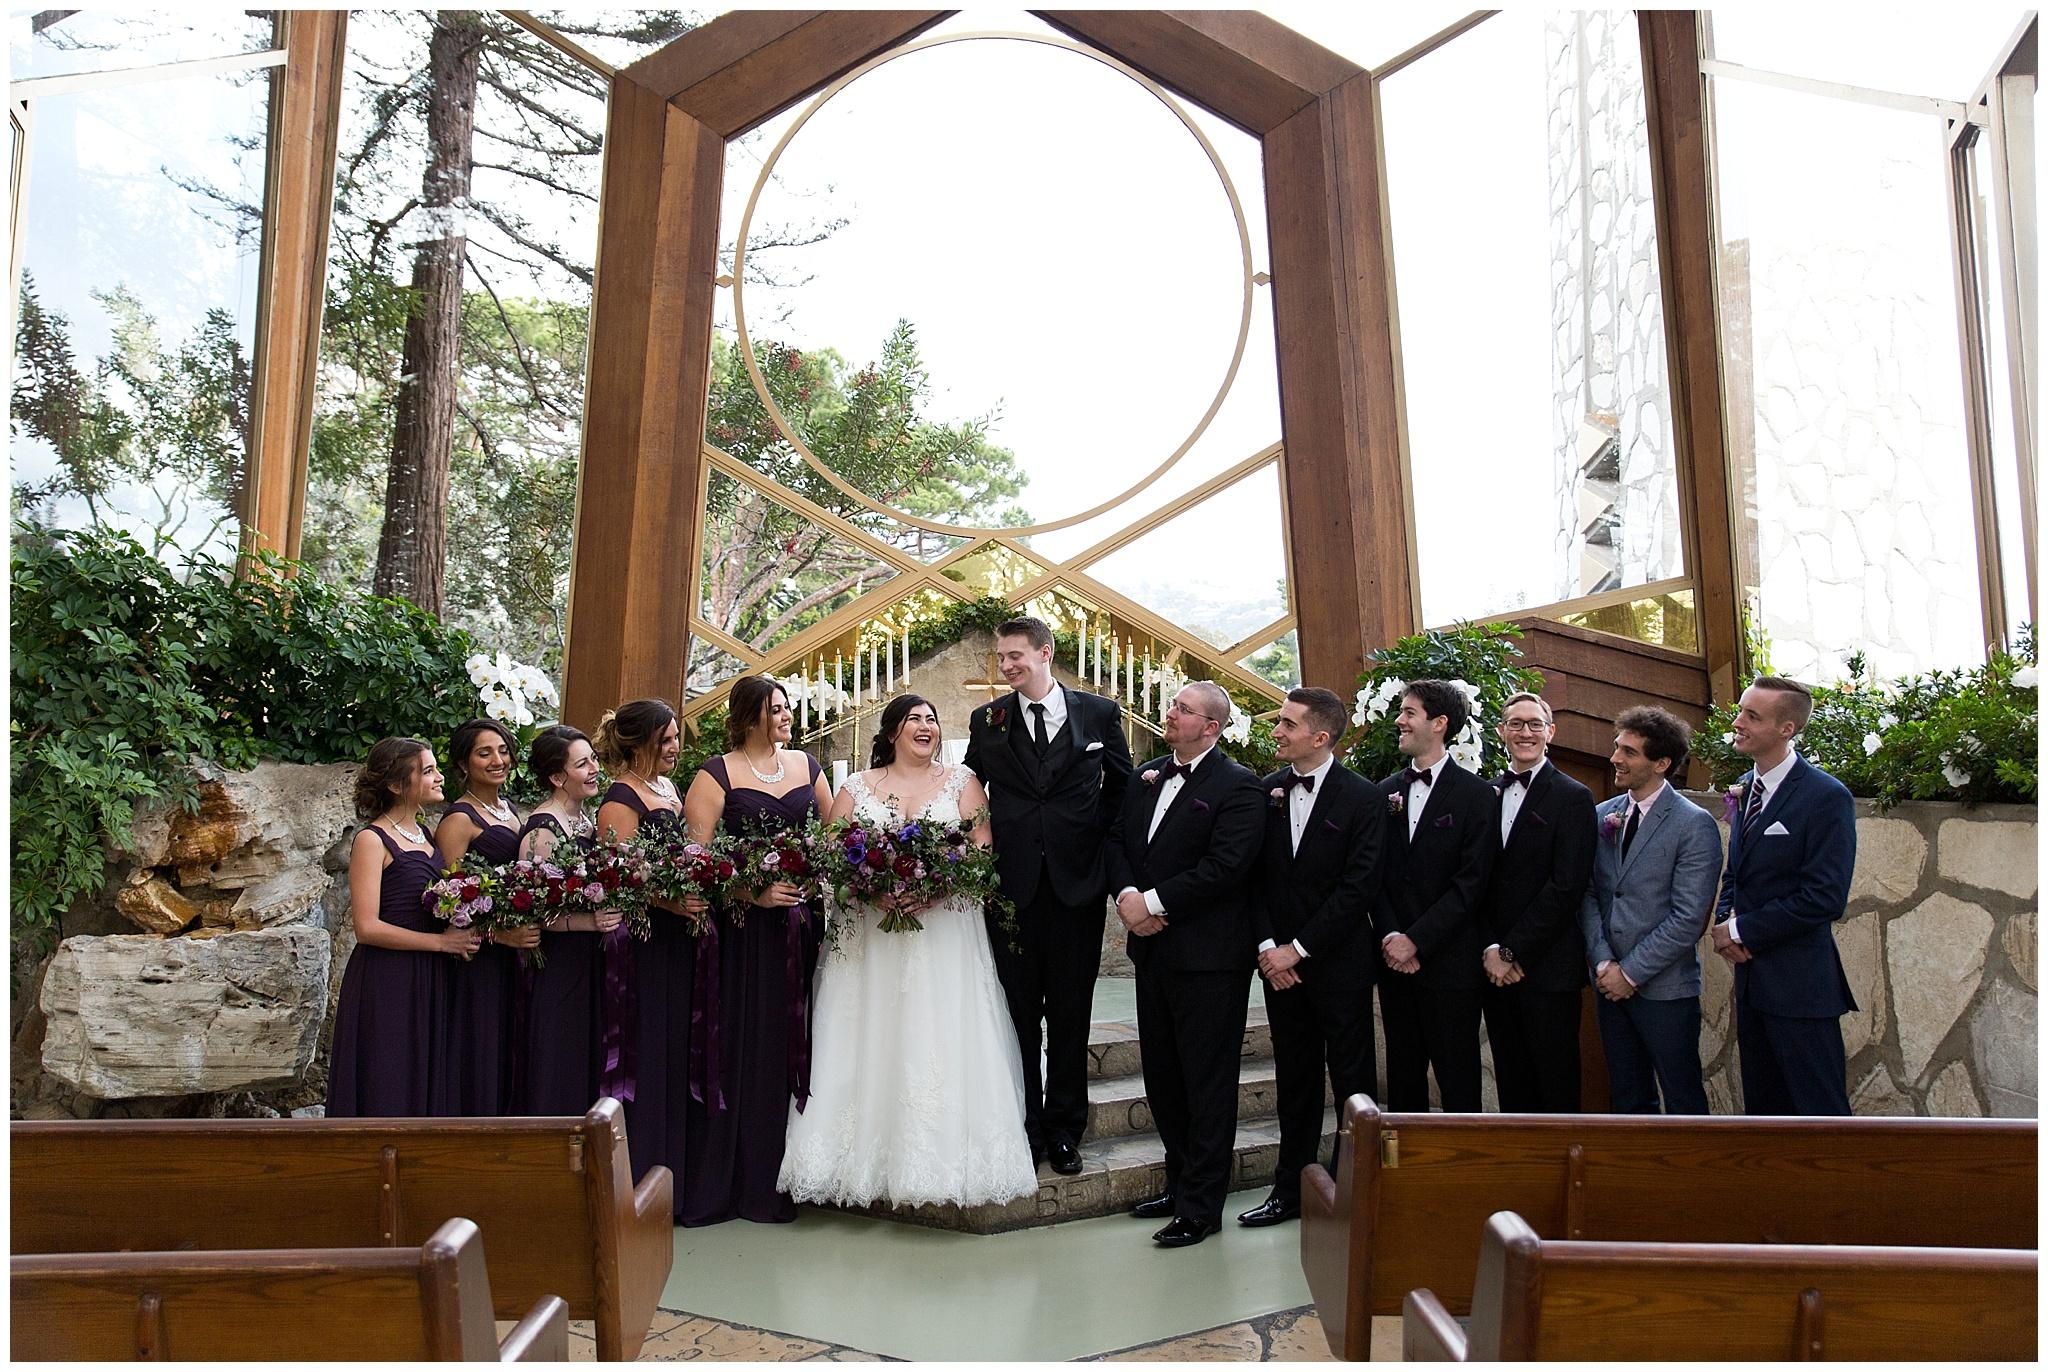 Carol_and_Grant_Wedding_3-3-18-8167-2.jpg